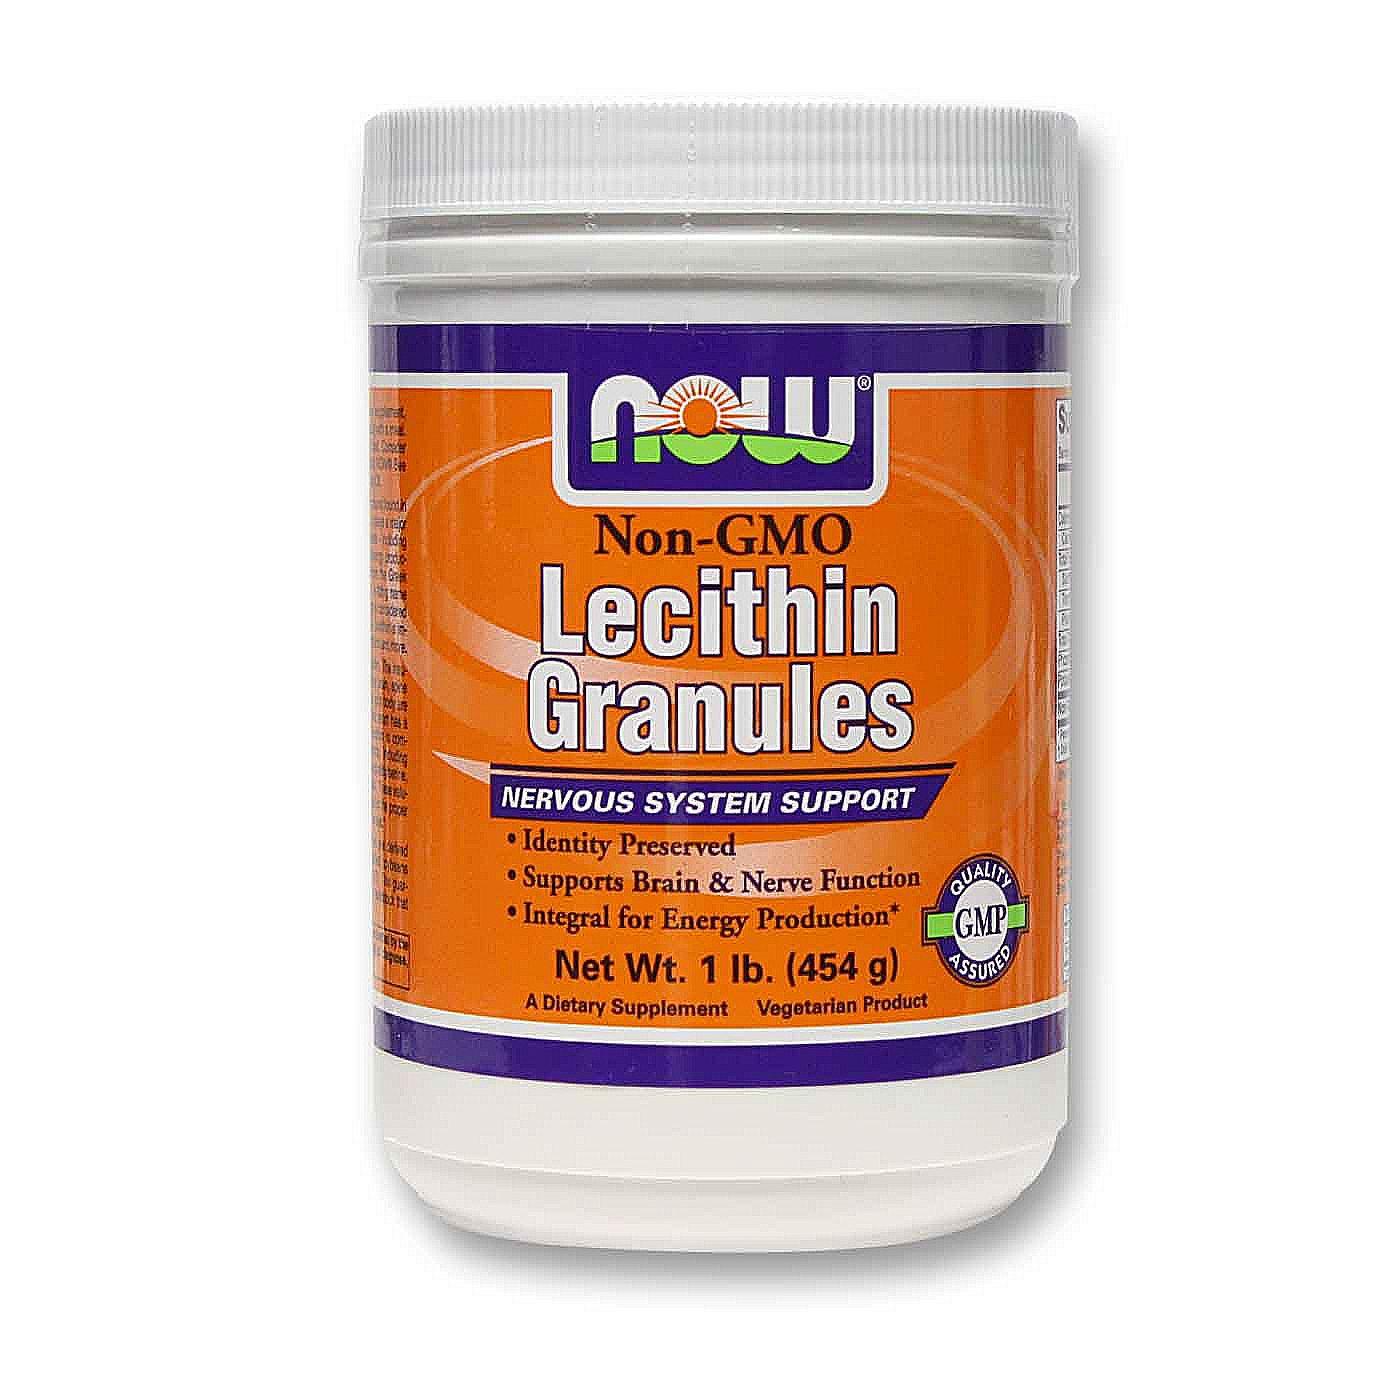 Granular lecithin